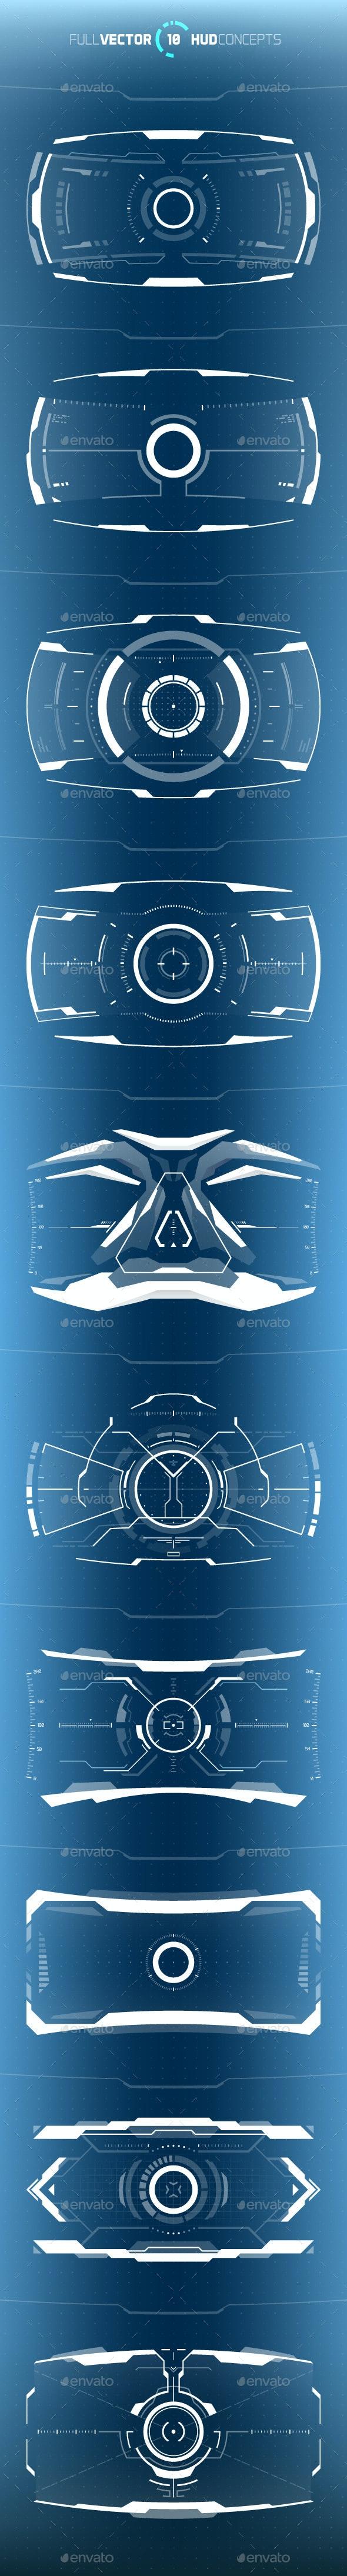 Conceptual 10 Hi-Tech HUD Set - Computers Technology